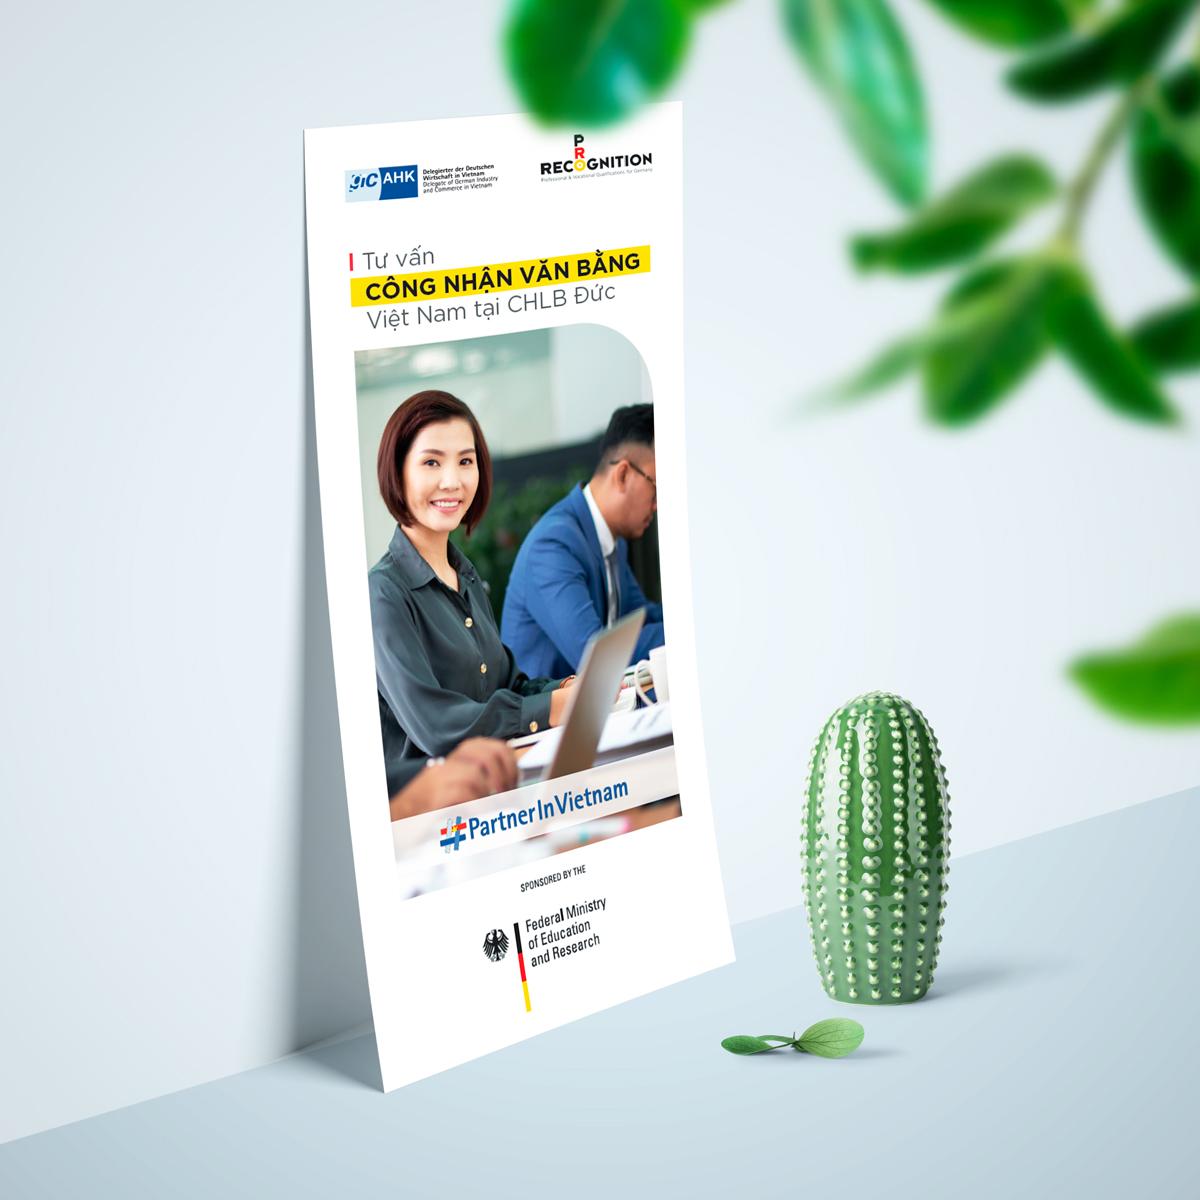 AHK_thiet_ke_brochure_chuyen_nghiep_gia_tot_1,8